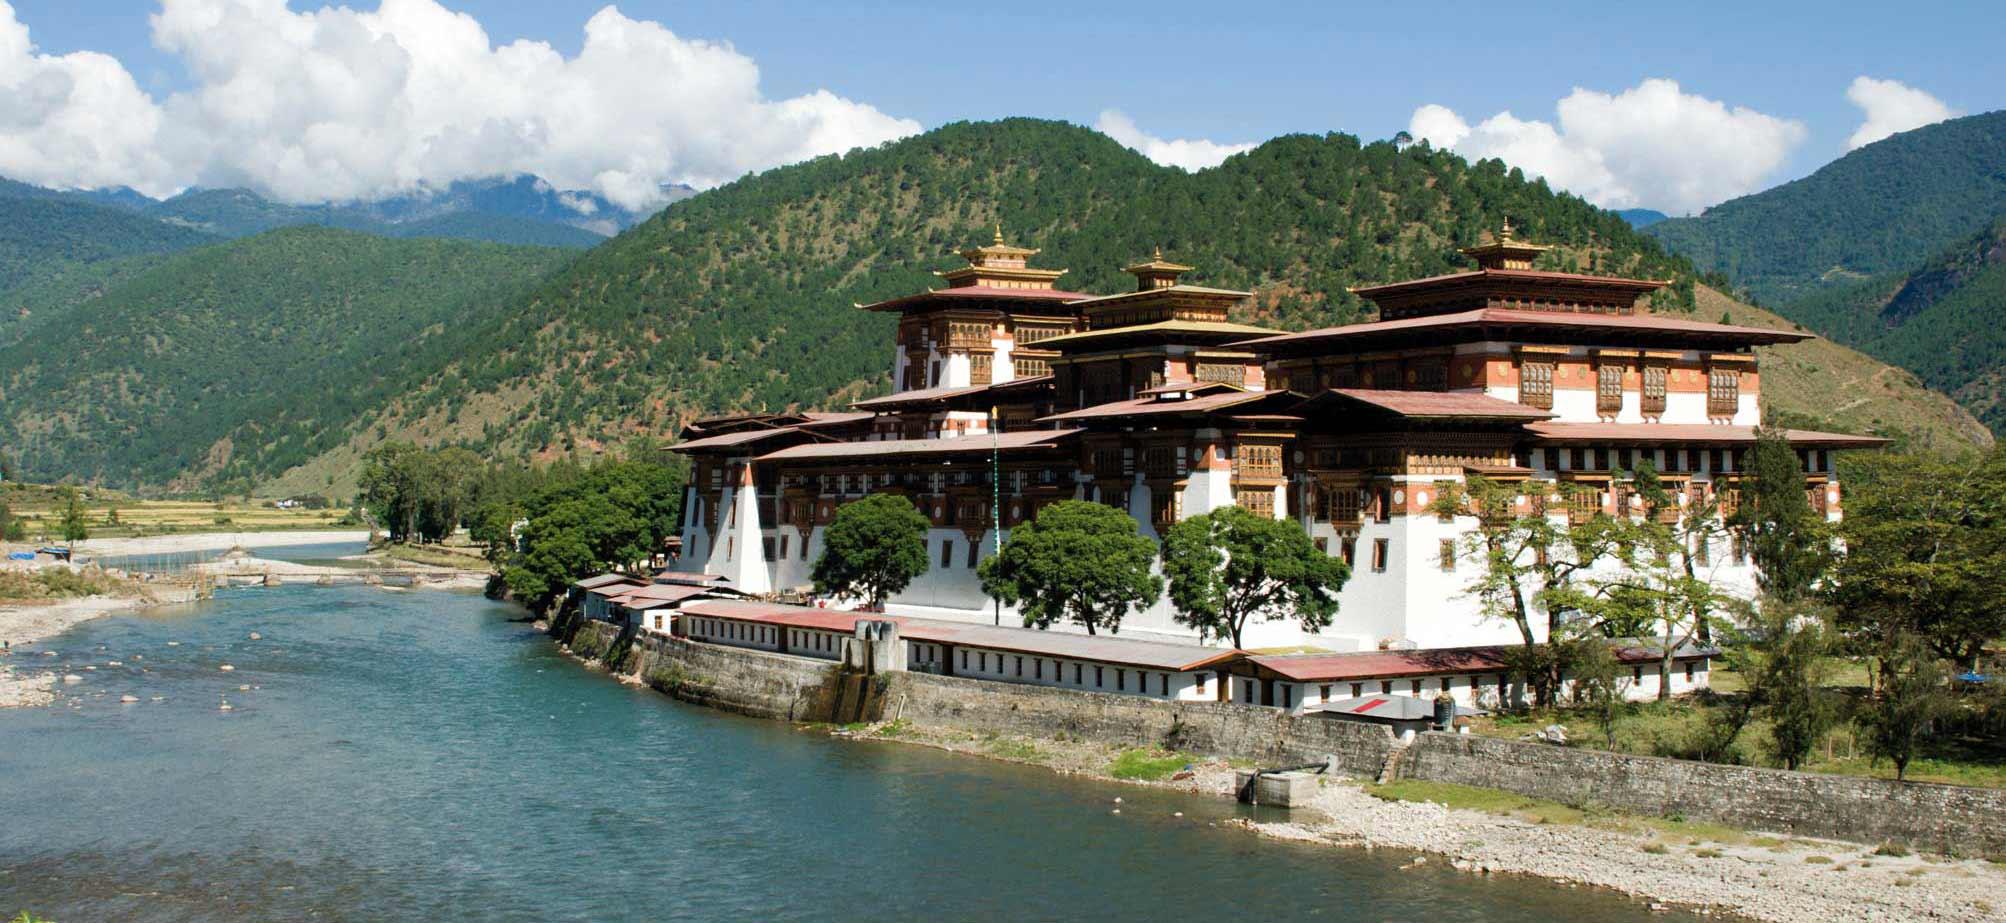 1489472193-bhutan-punakh-monastery.jpg